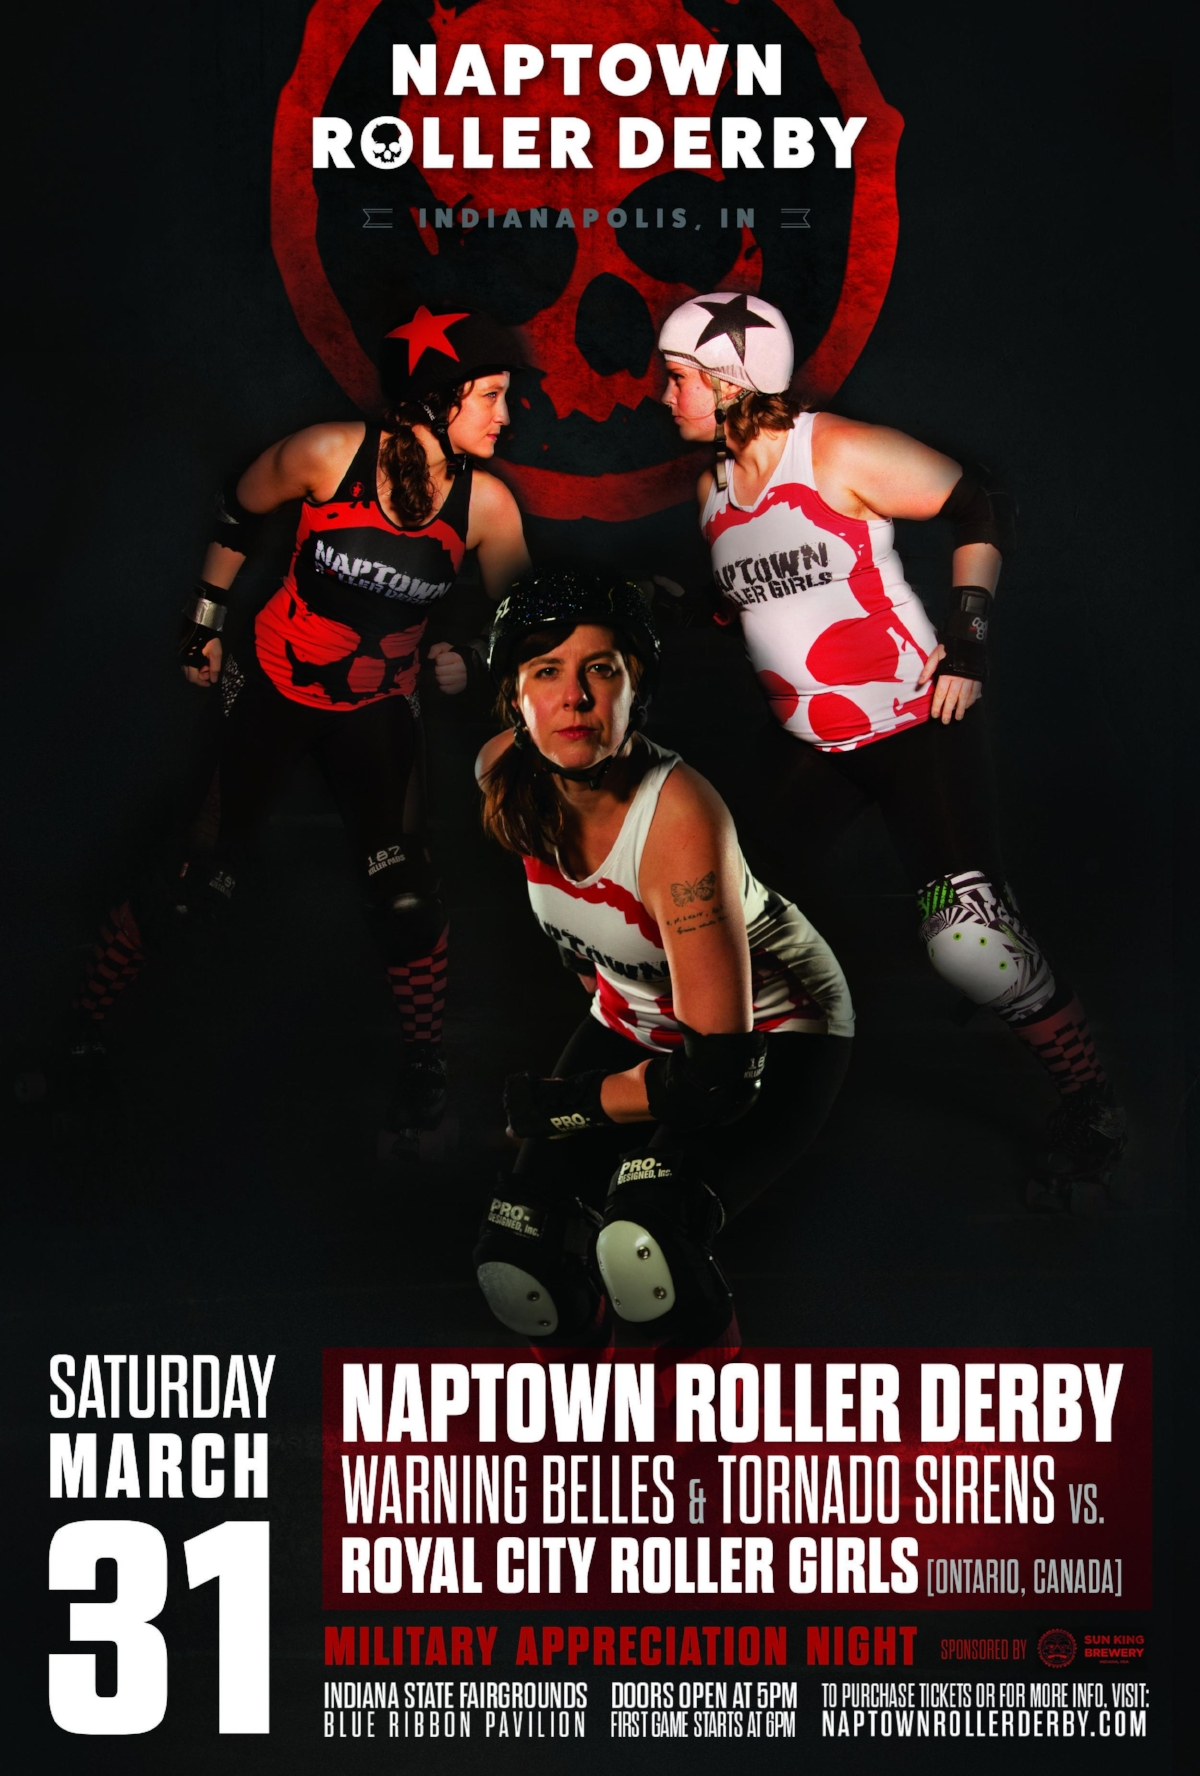 March 31, 2018 - Naptown vs. Royal City!